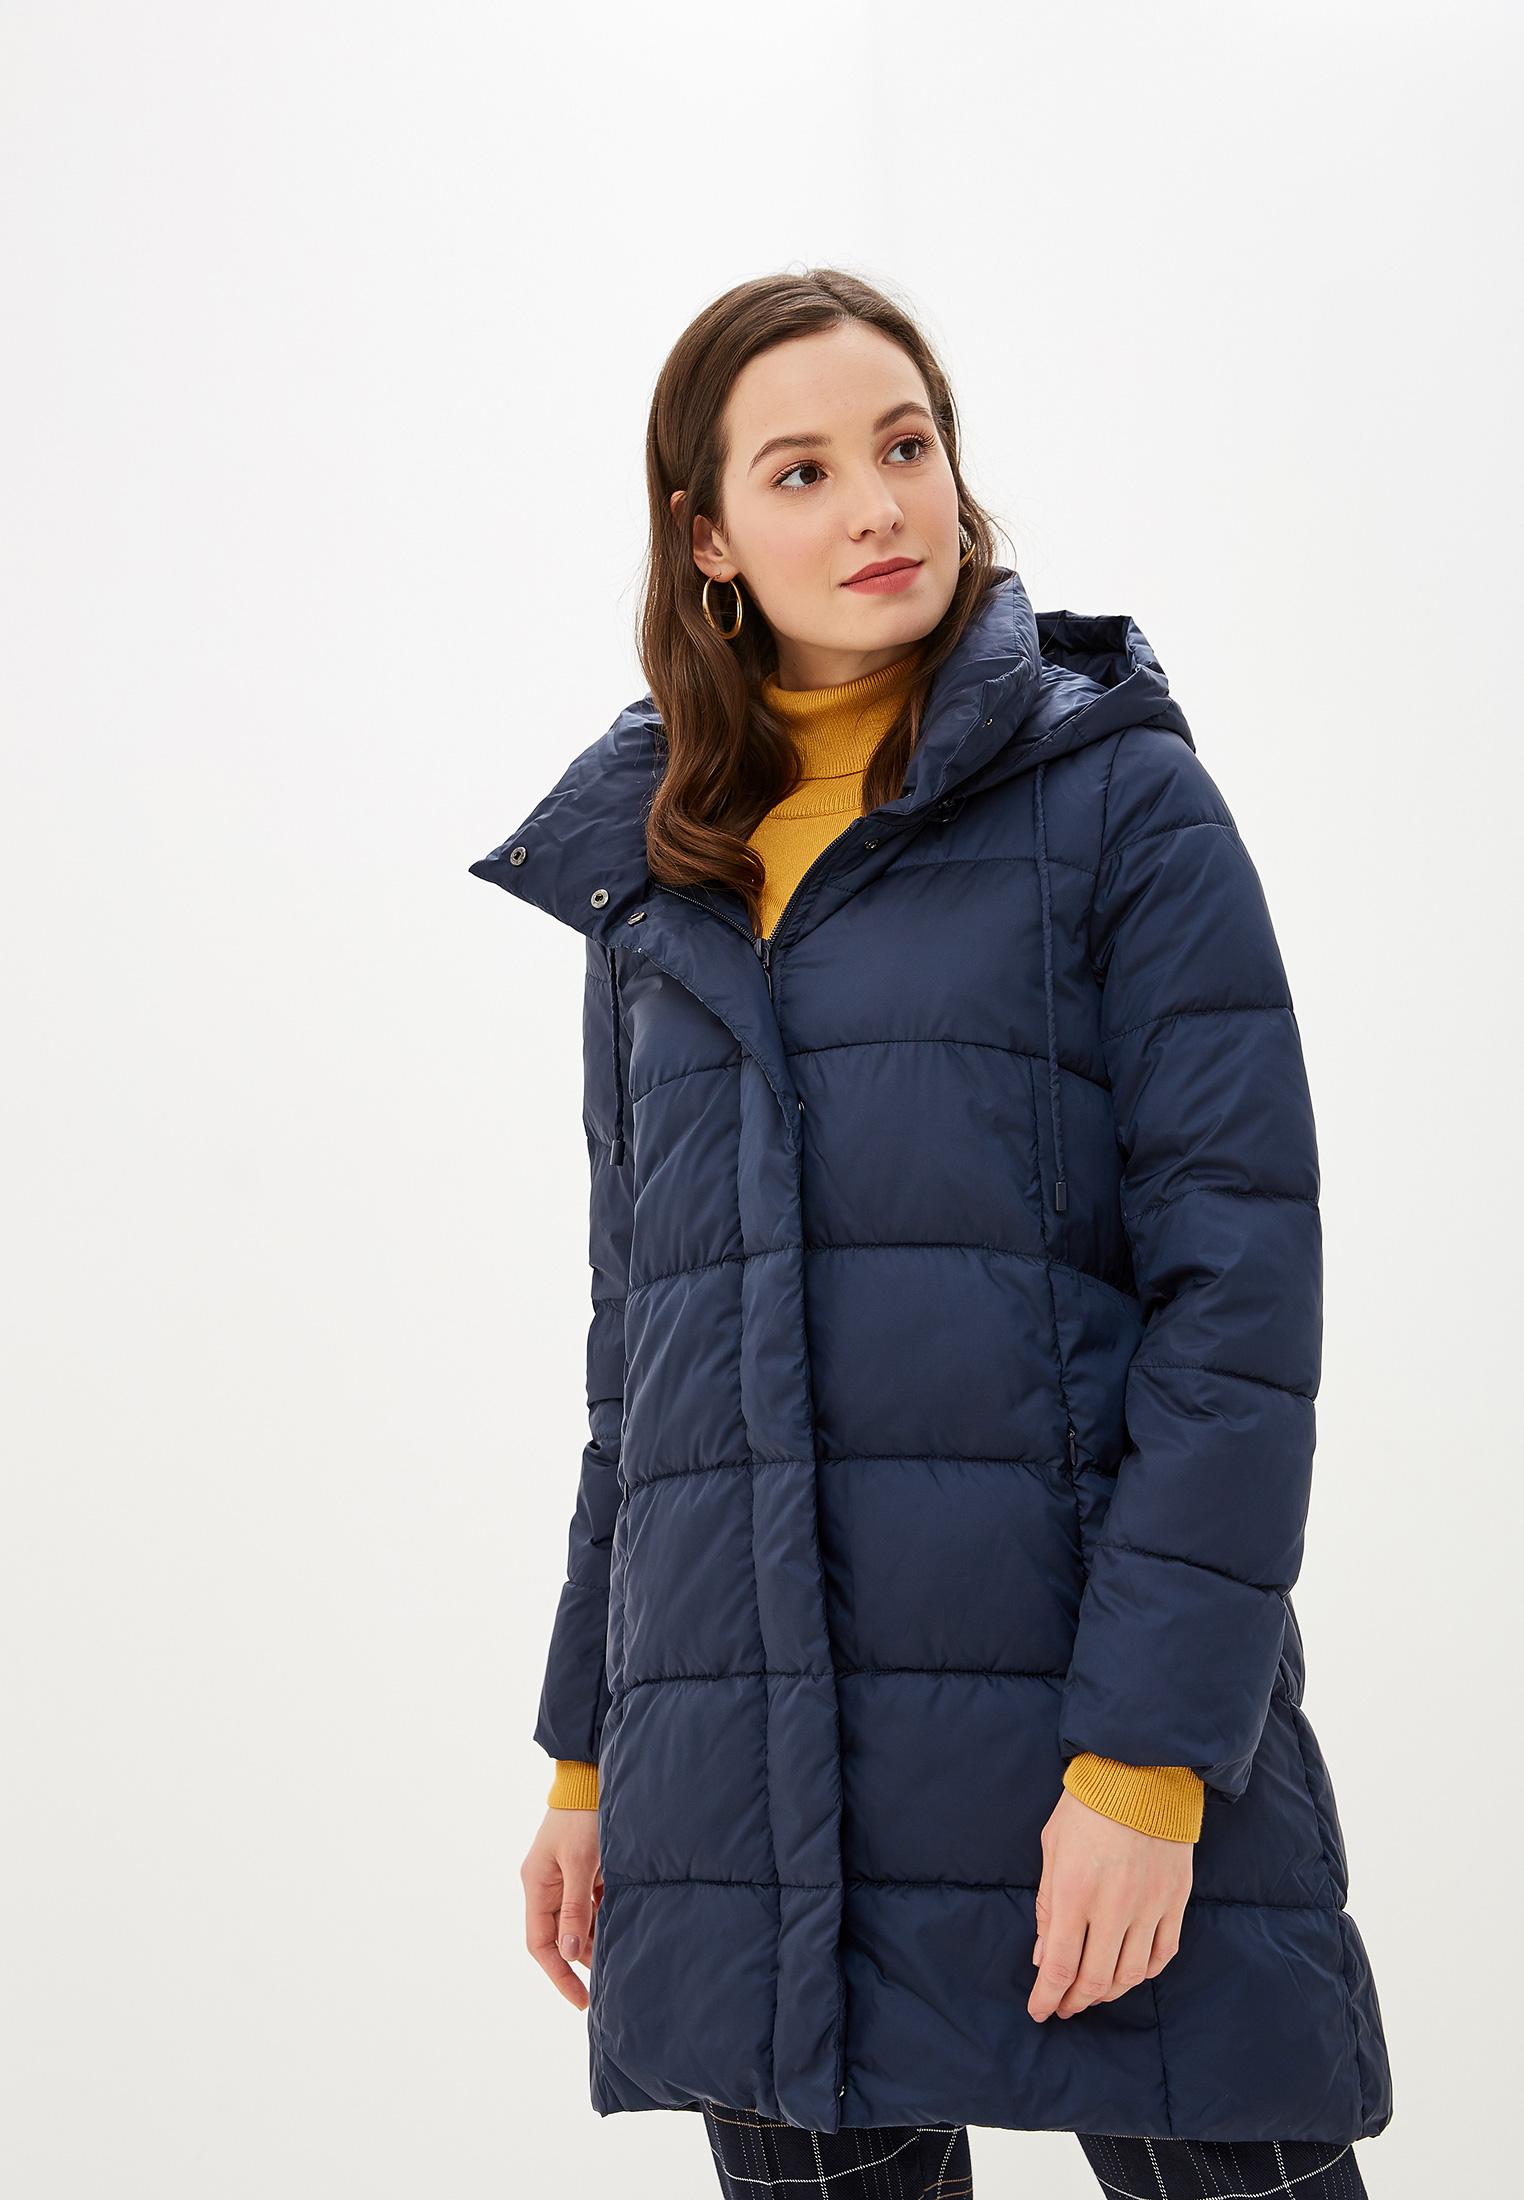 Куртка утепленная, Savage, цвет: синий. Артикул: SA004EWGESE5. Одежда / Верхняя одежда / Пуховики и зимние куртки